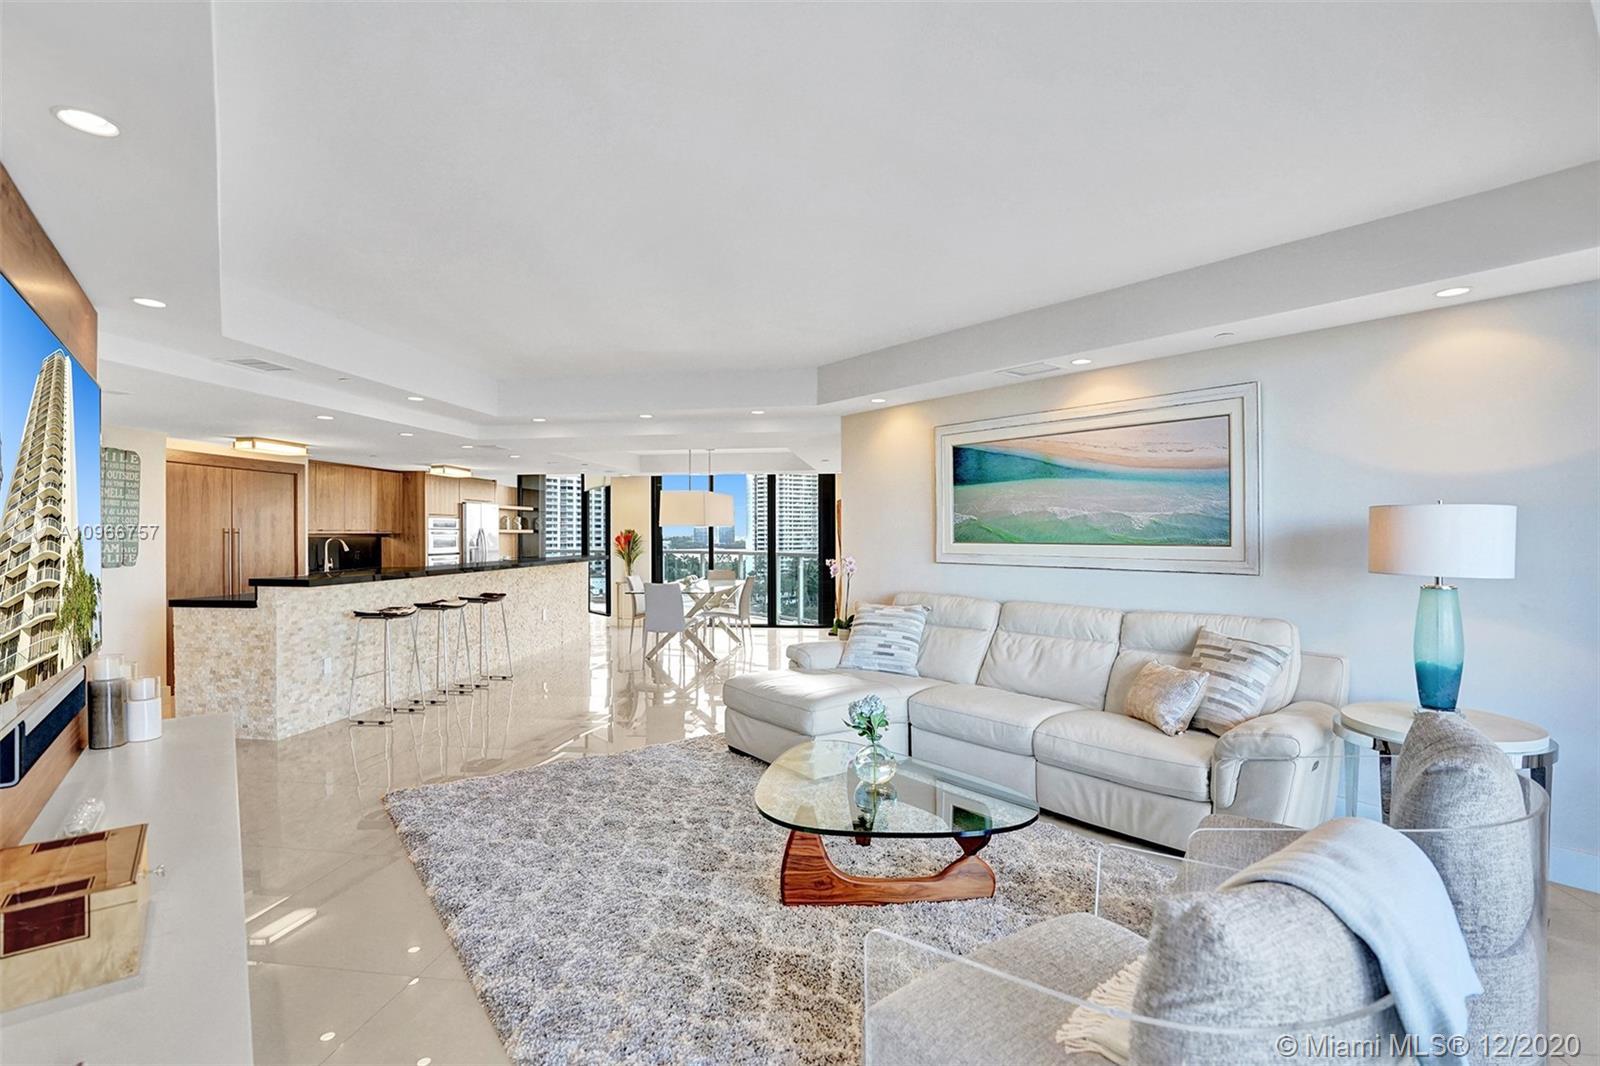 4000 Williams Island #1204 - 4000 Island Blvd #1204, Aventura, FL 33160